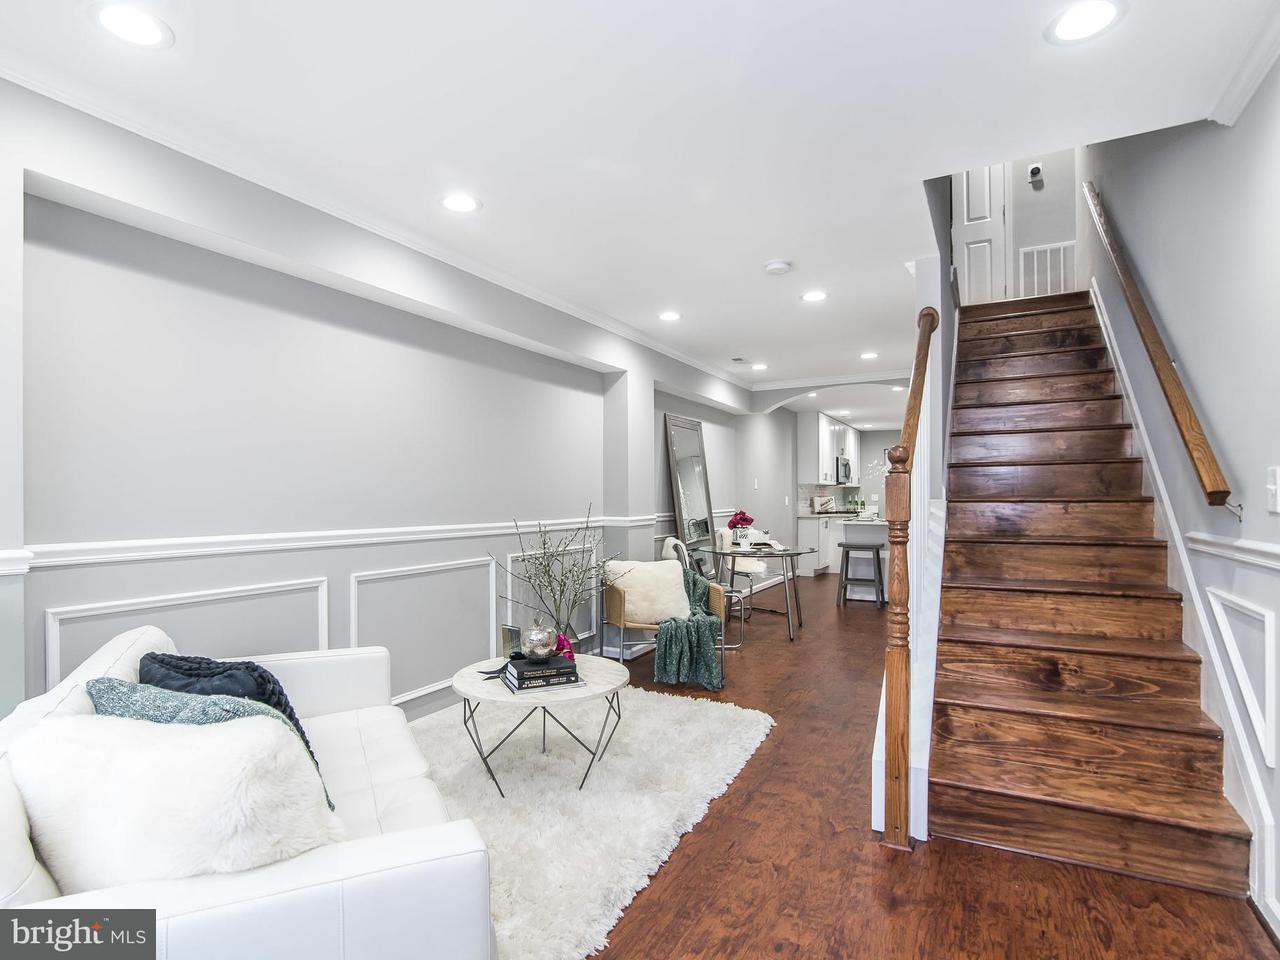 Single Family for Sale at 419 Washington St S Baltimore, Maryland 21231 United States